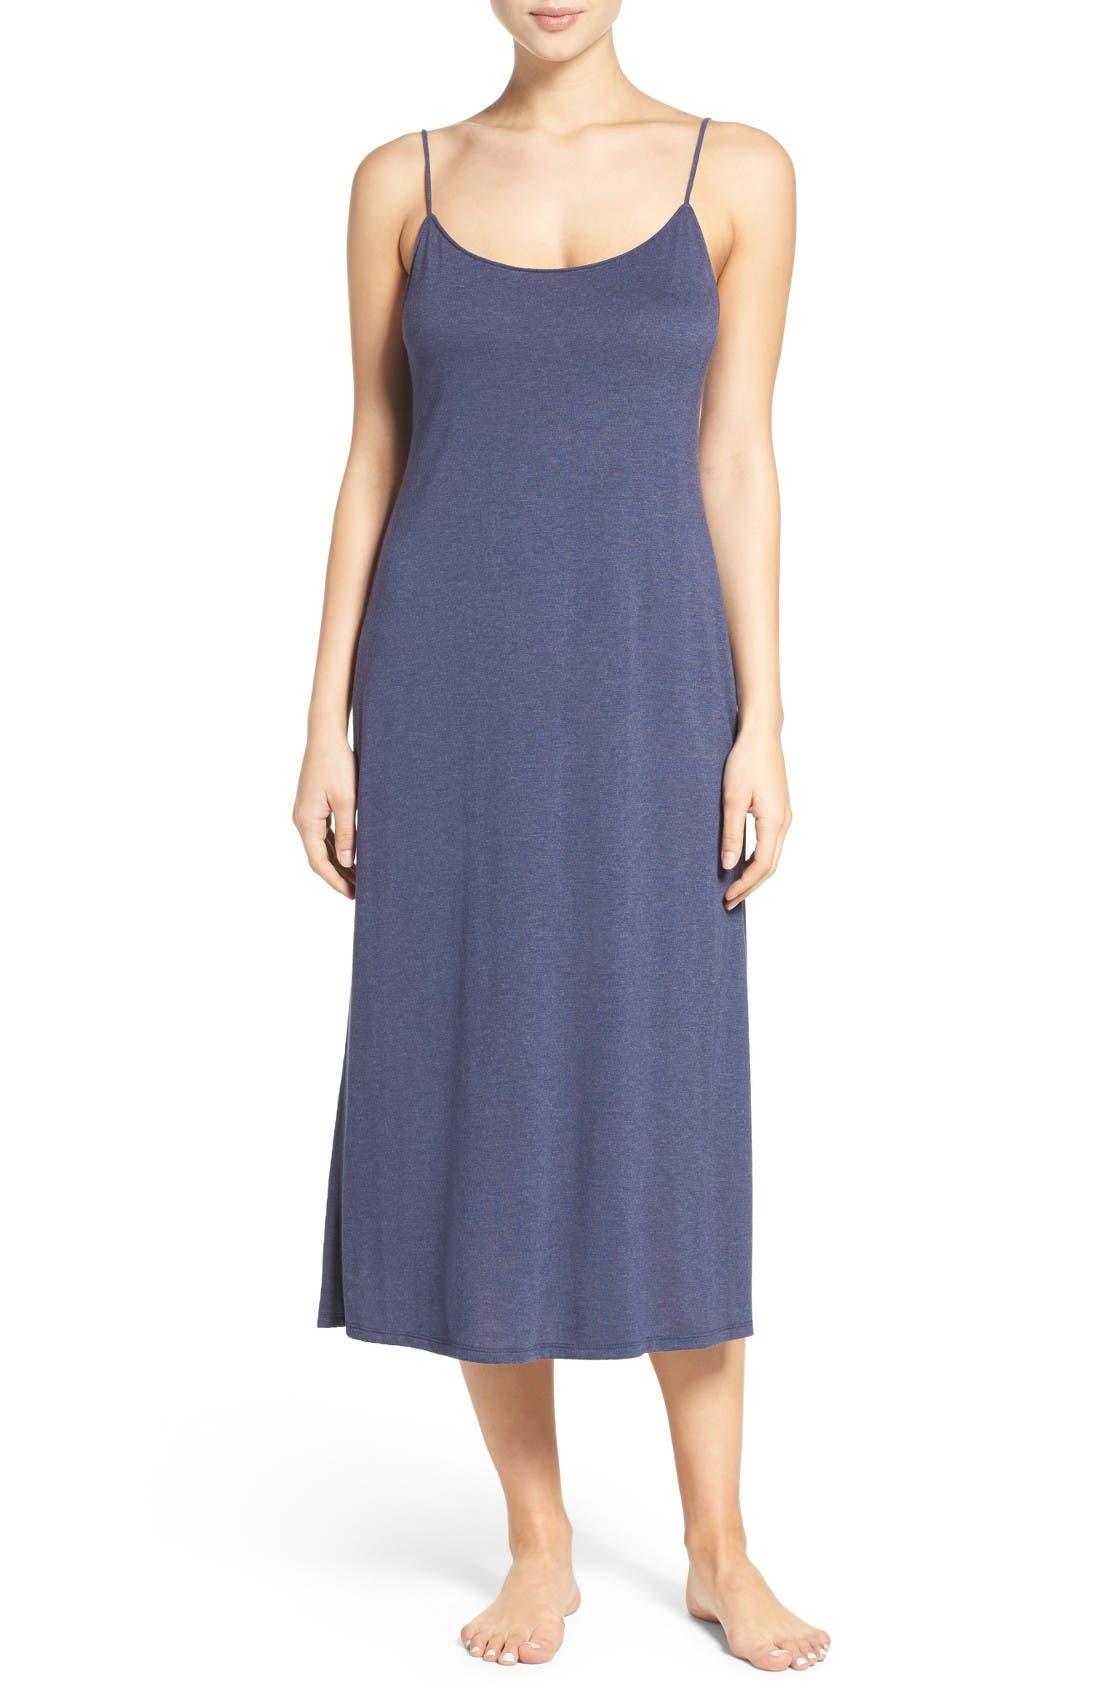 Shangri La Nightgown,                         Main,                         color, Heather Night Blue